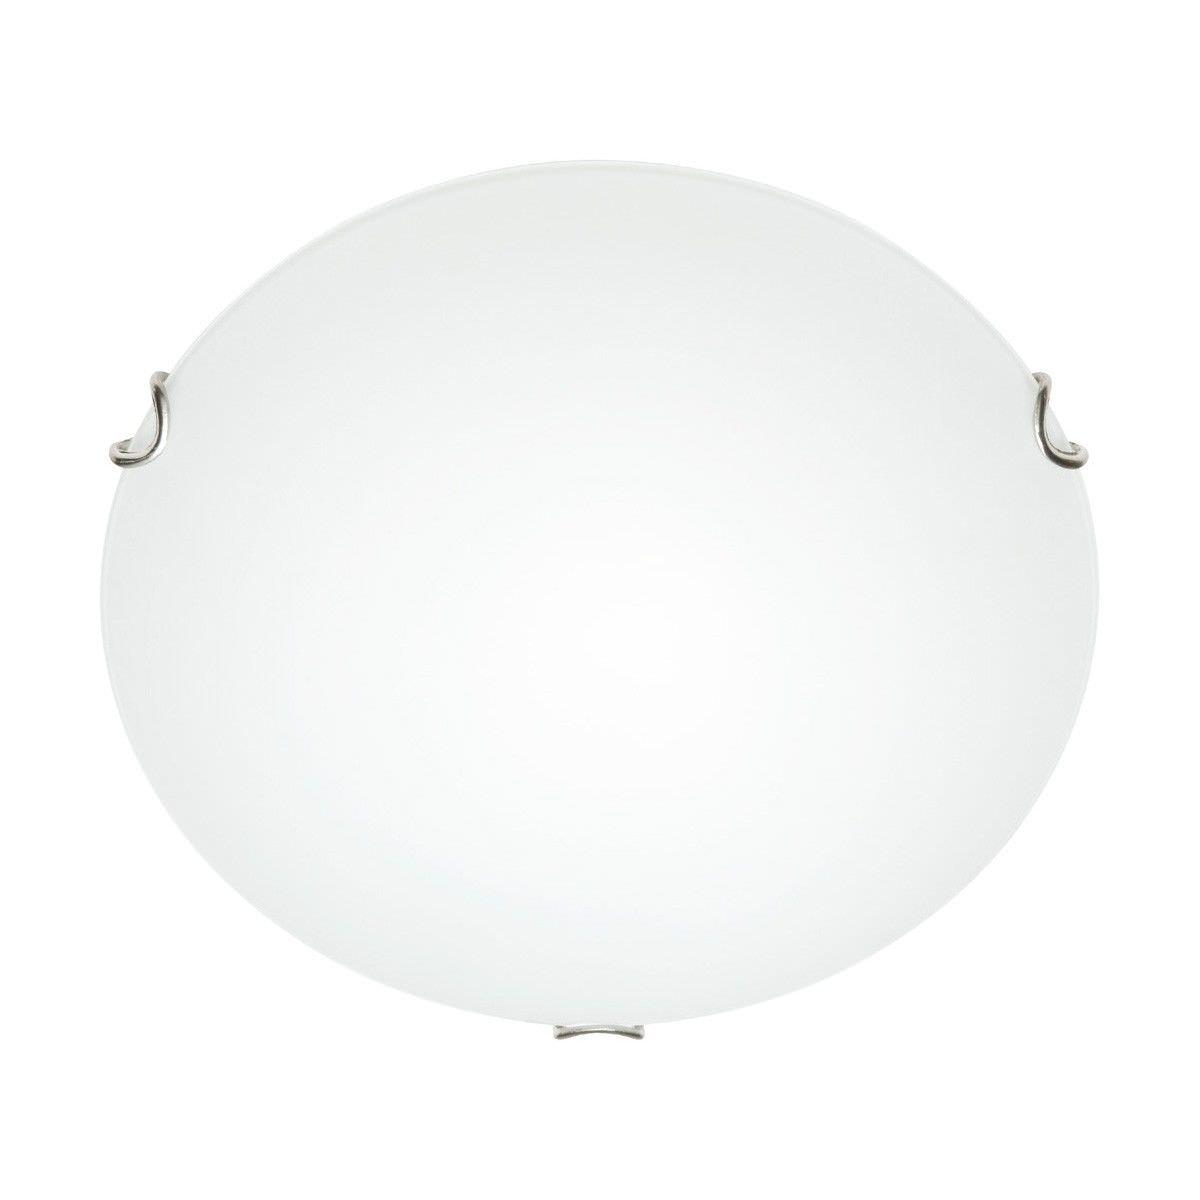 Cougar Delta 2 Light 40 cm Oyster Ceiling Light